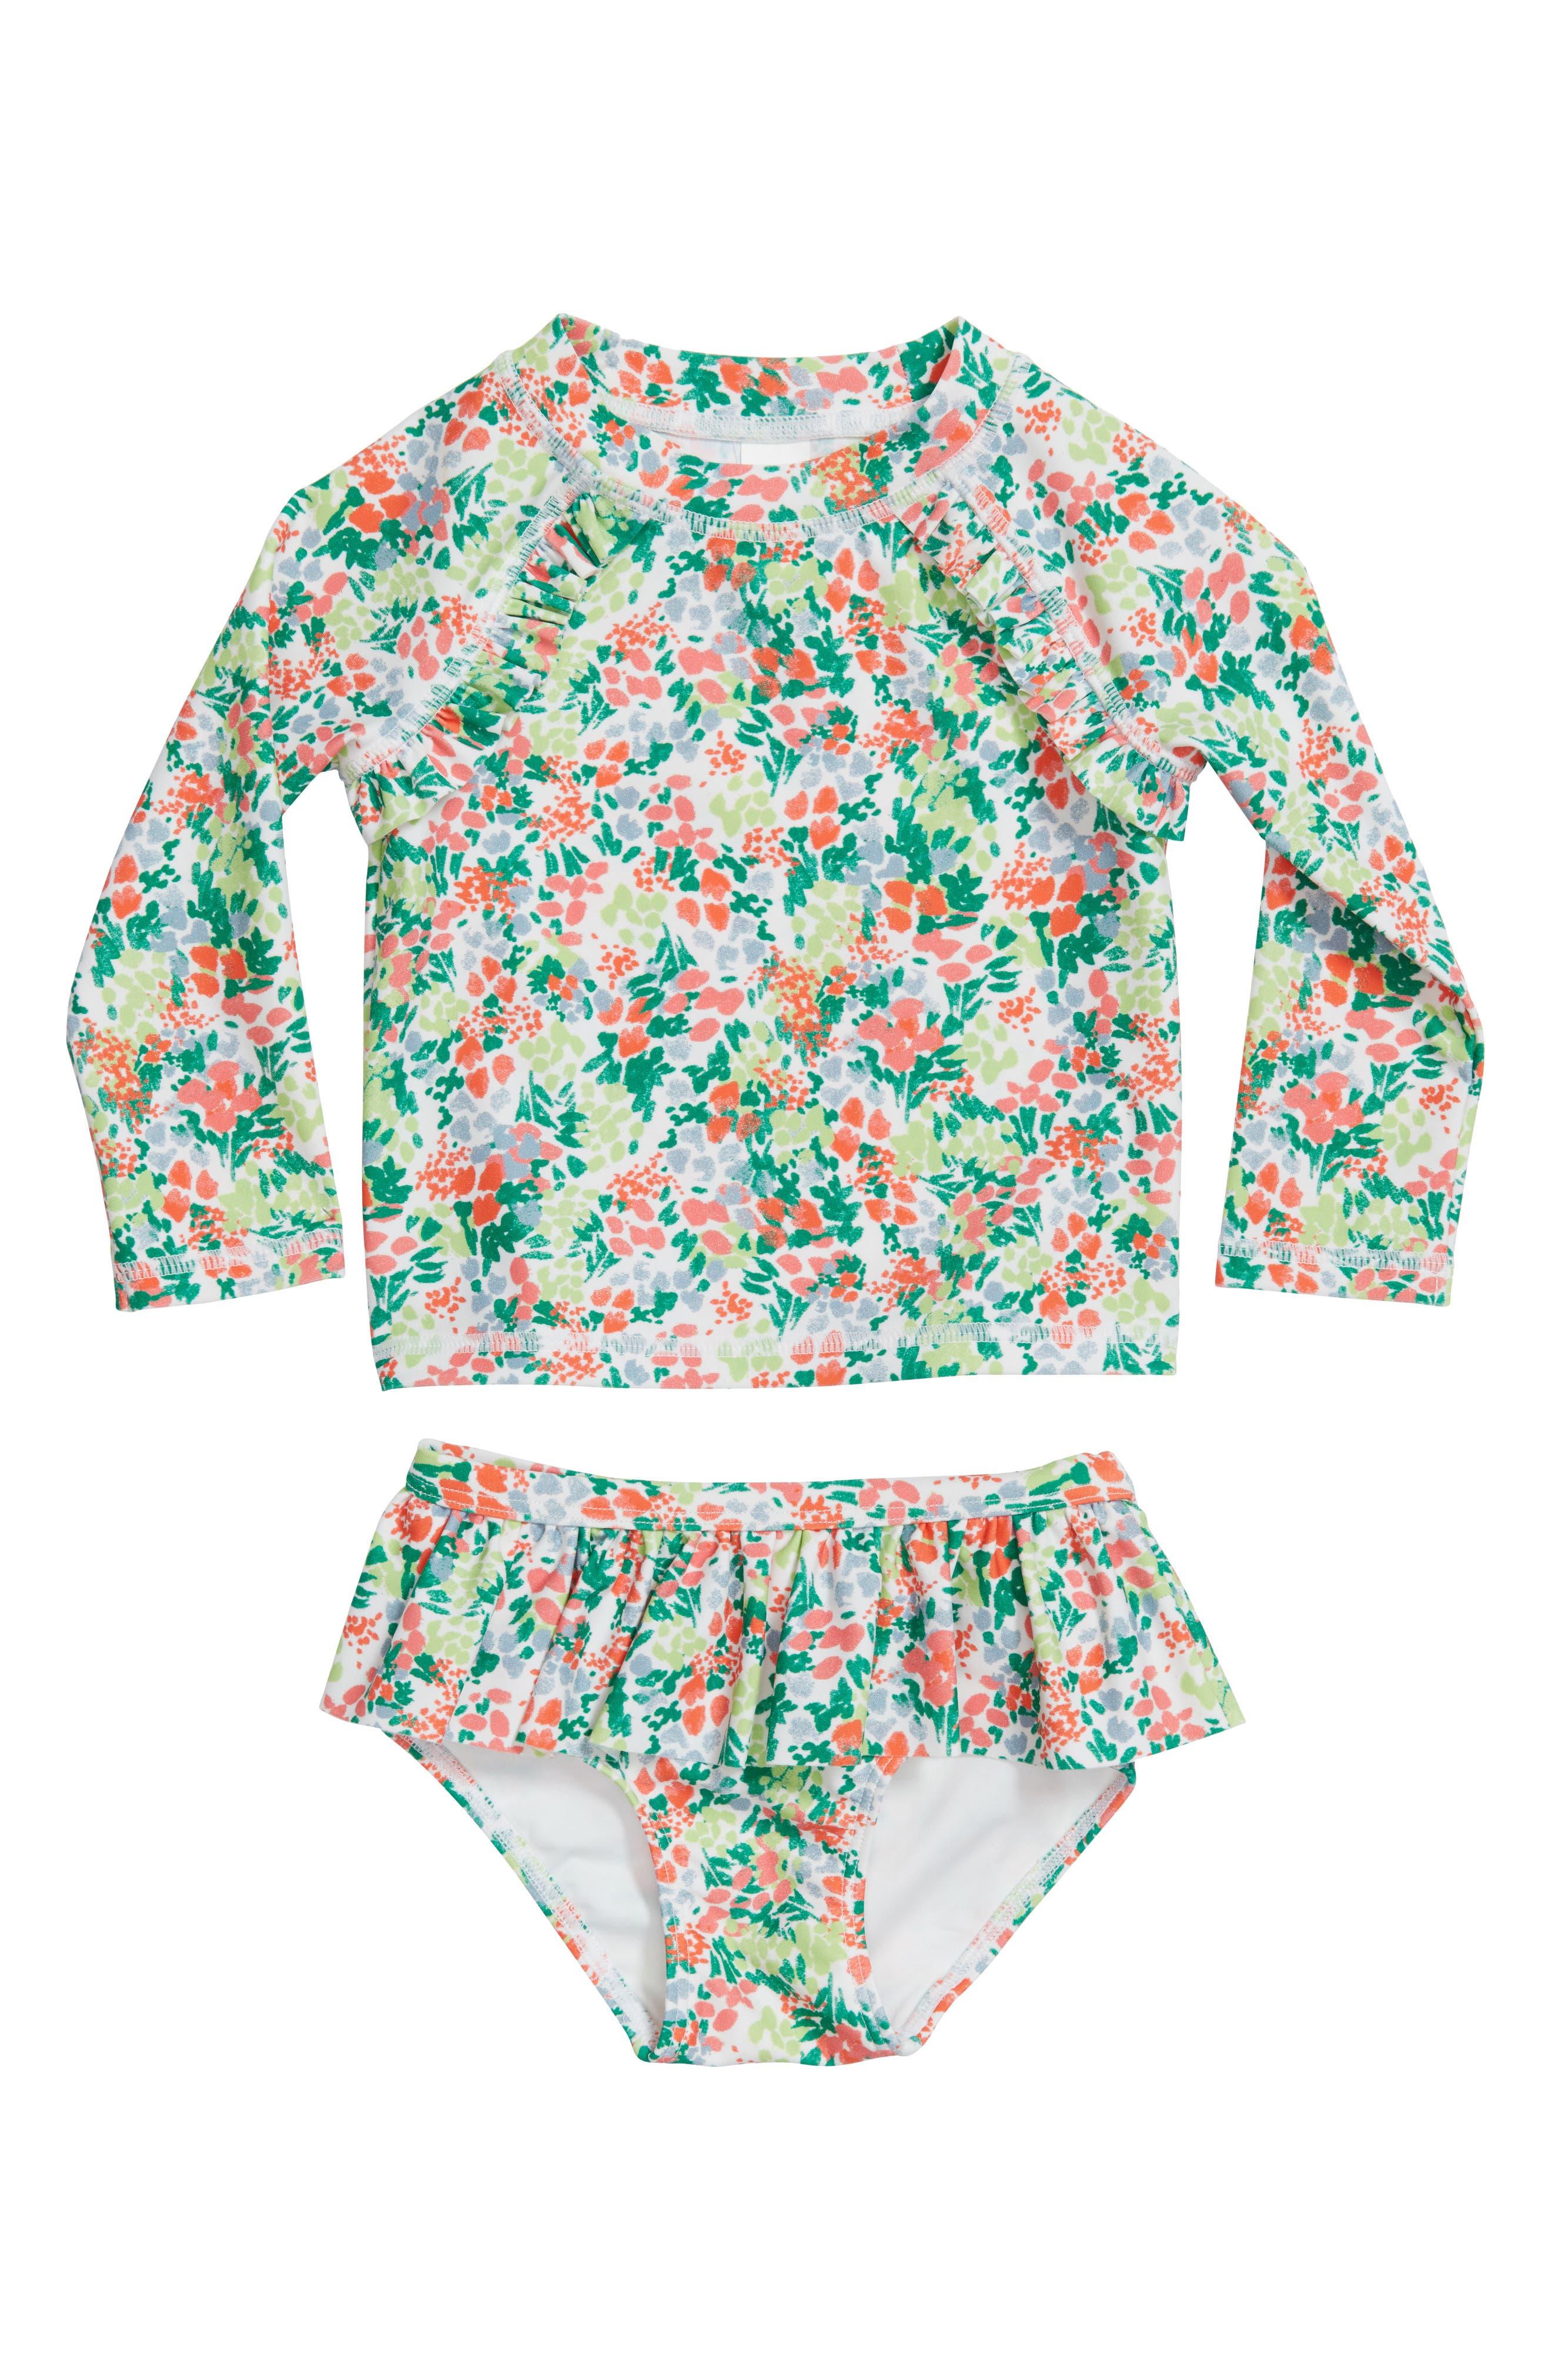 TUCKER + TATE Two-Piece Rashguard Swimsuit, Main, color, 100